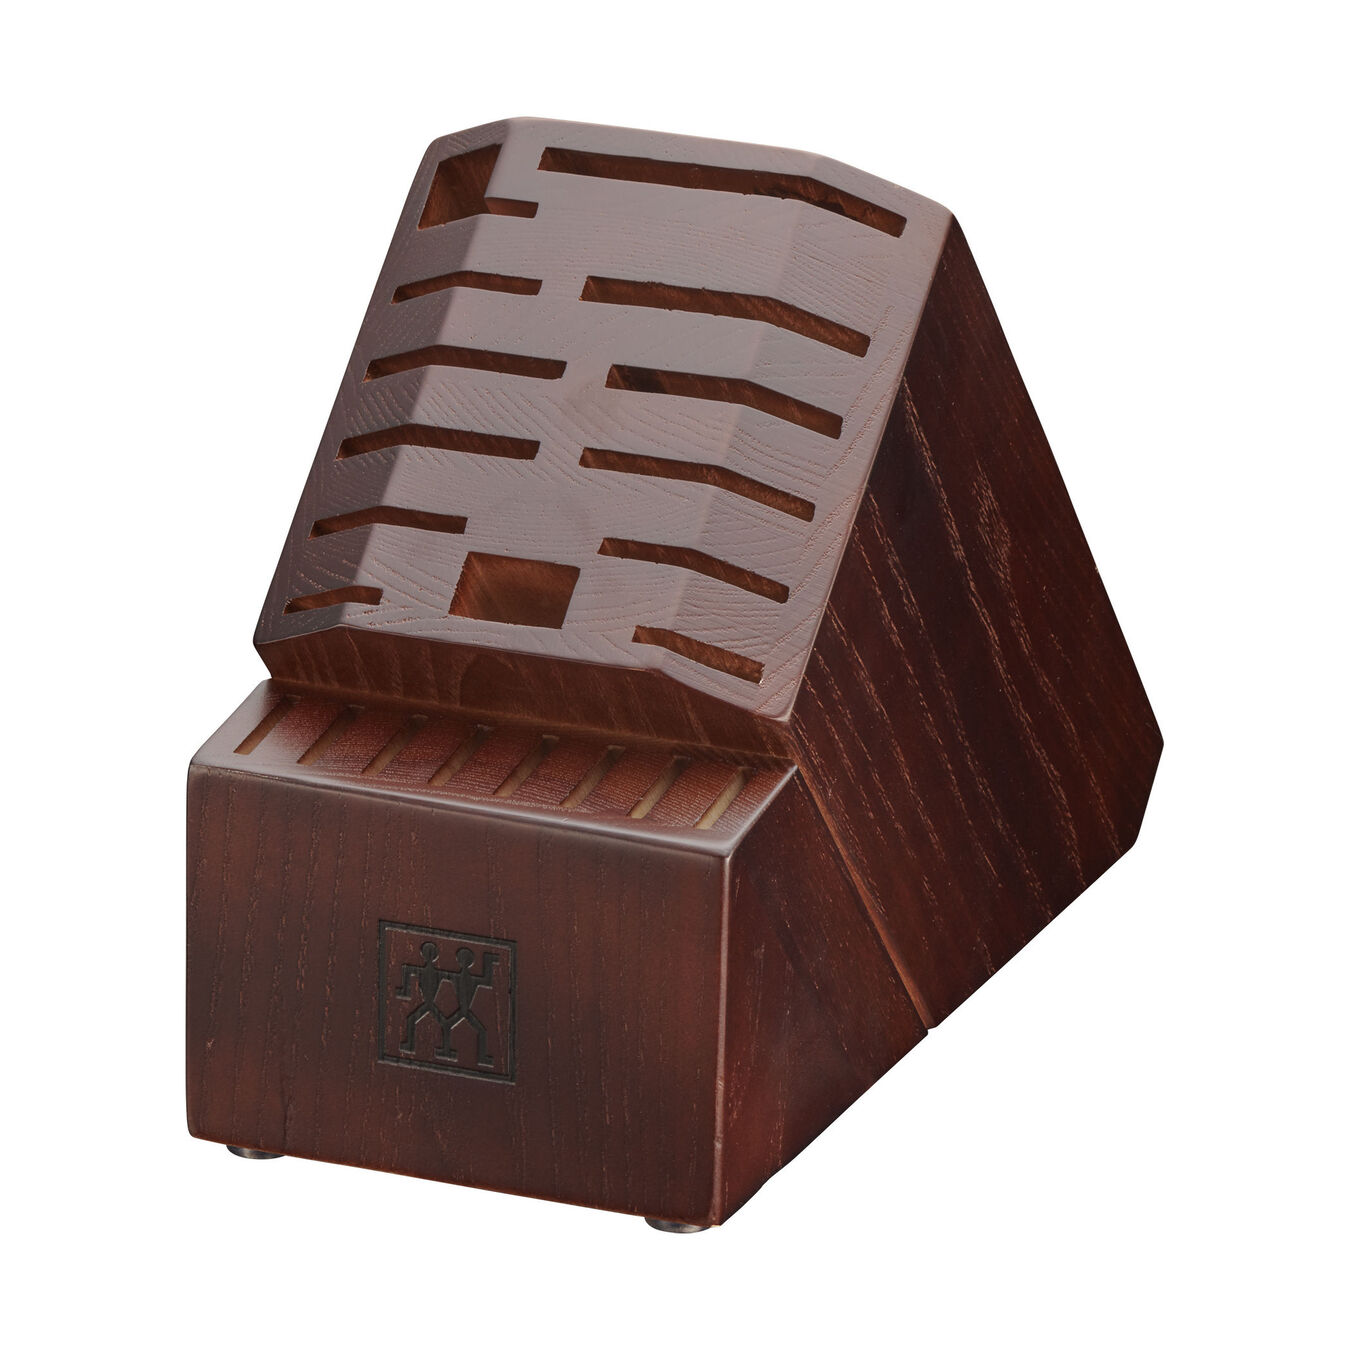 Ashwood 21-Slot Knife Block,,large 1